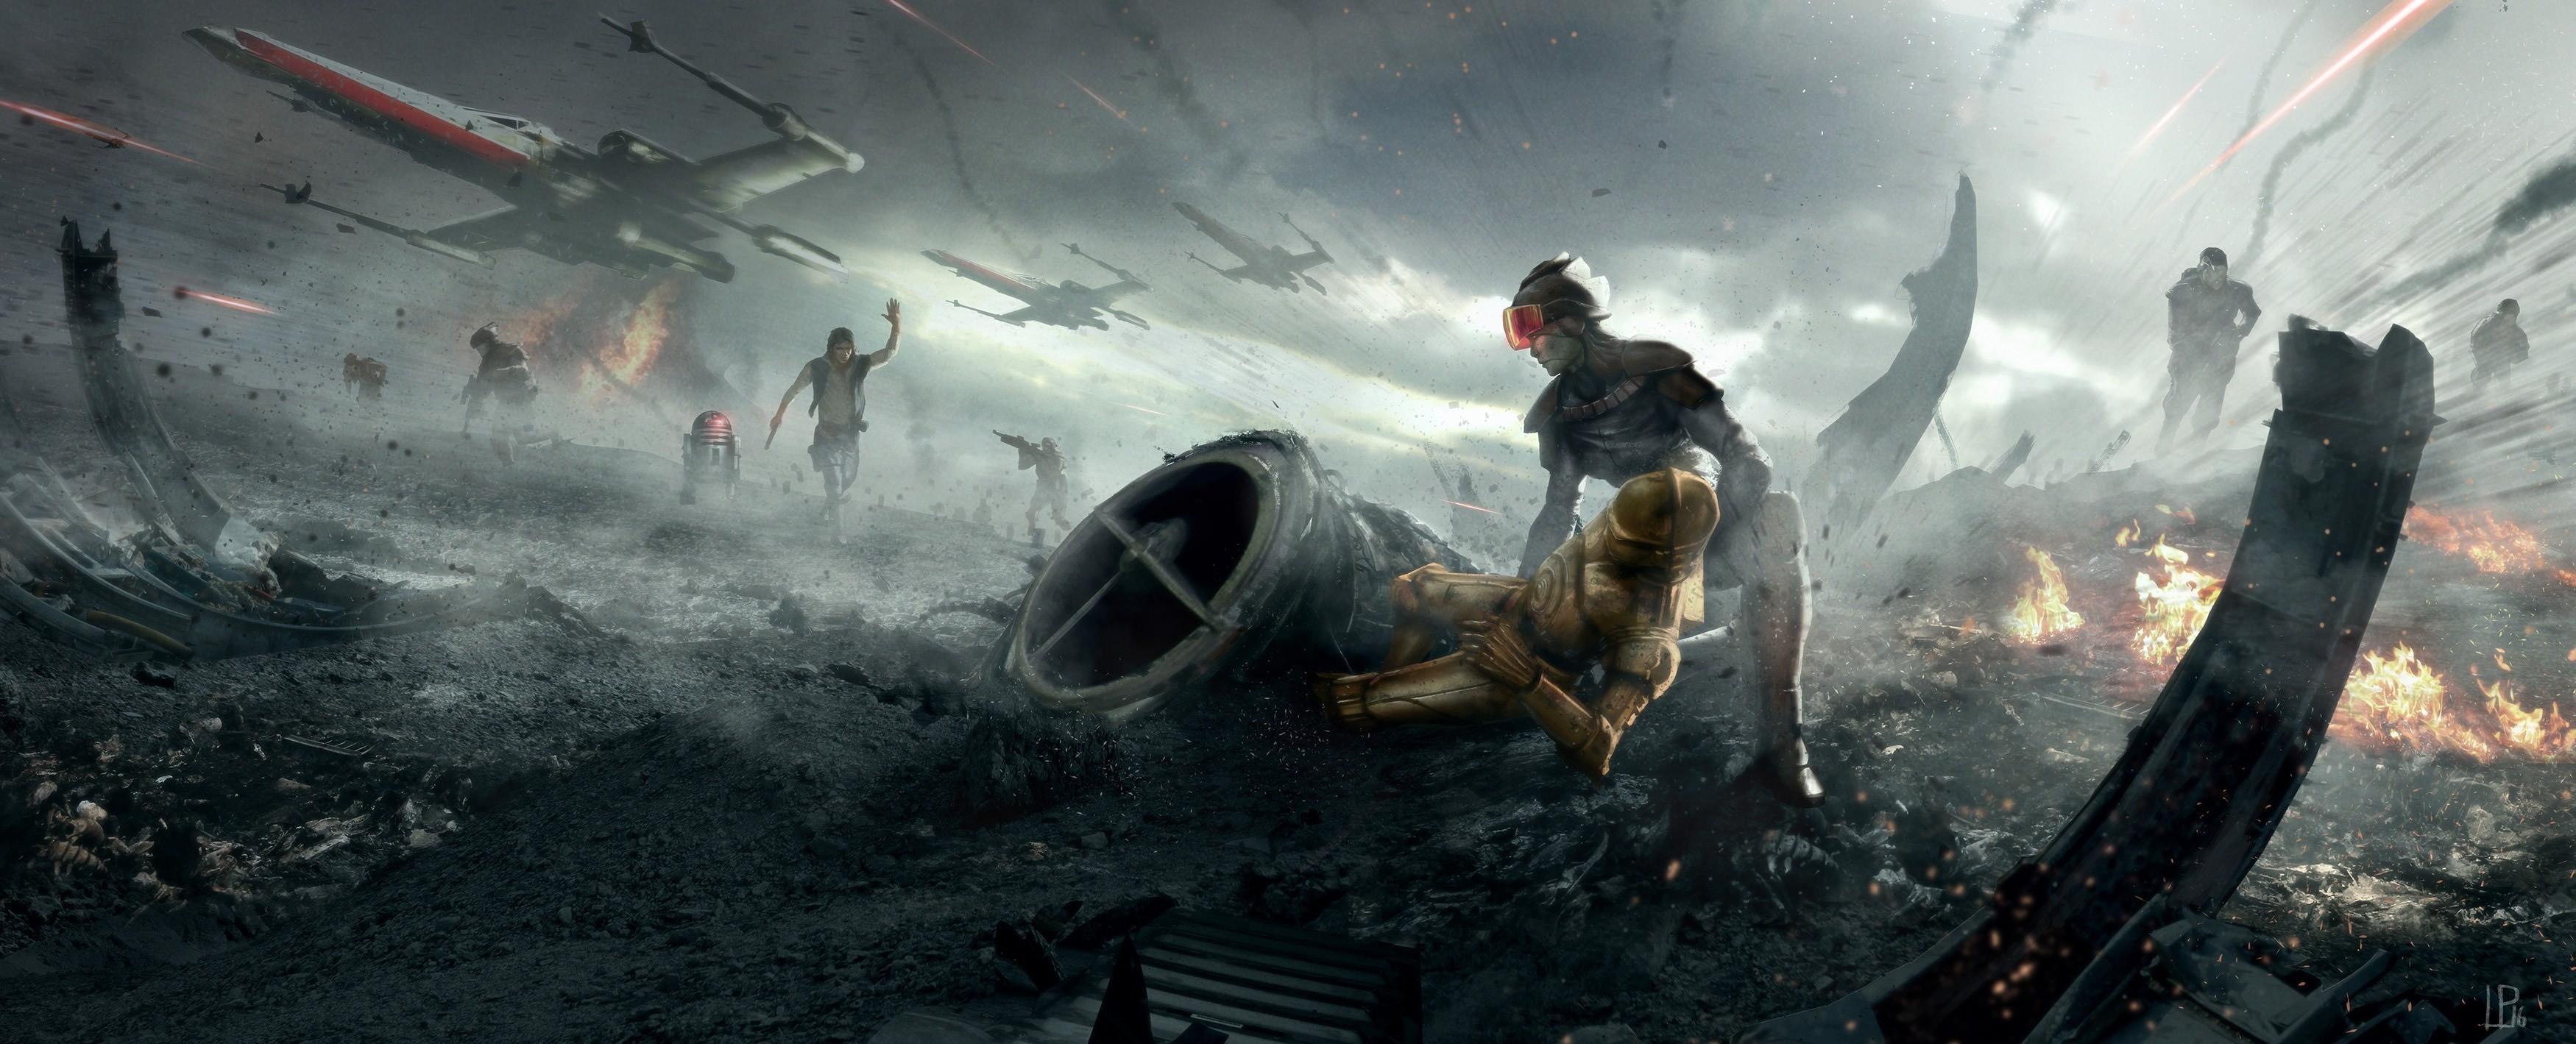 Wallpaper Star Wars Artwork Soldier Screenshot